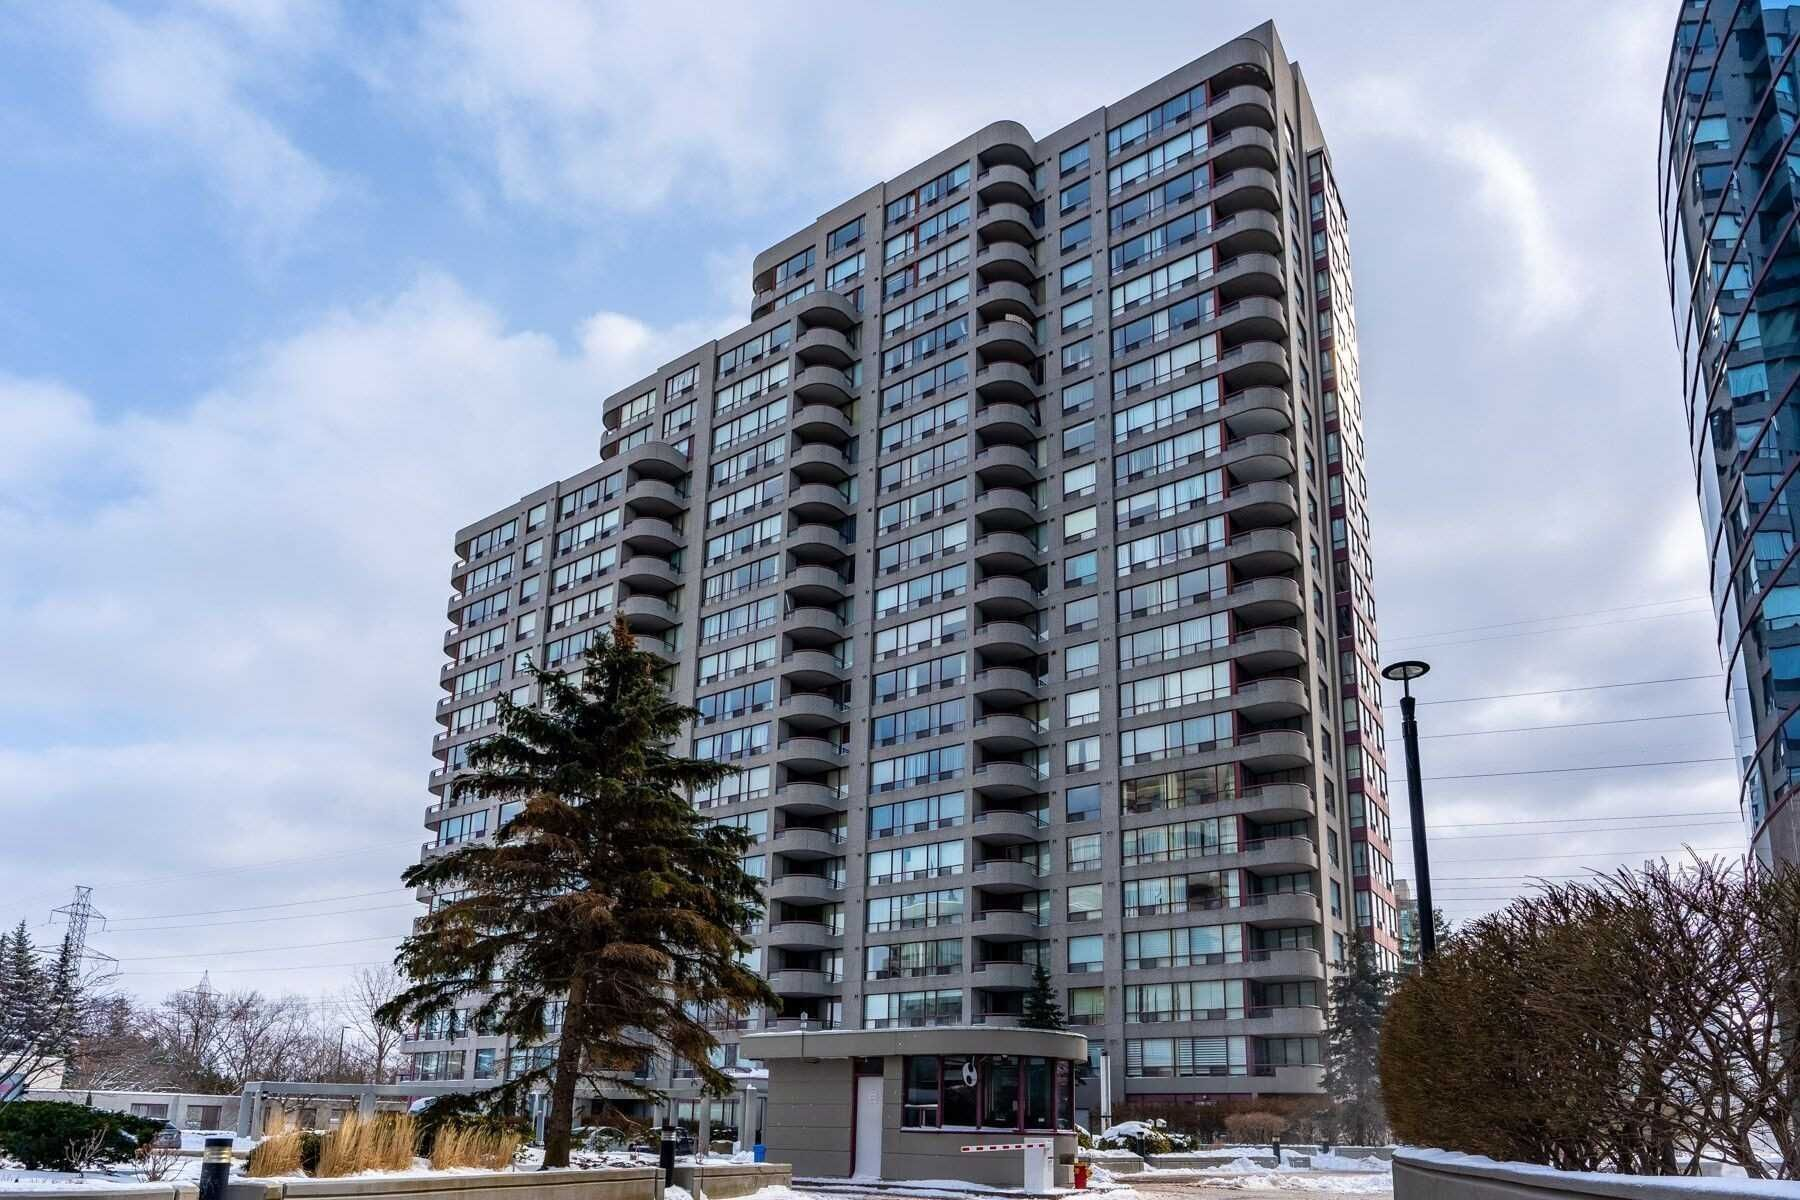 Main Photo: 1103 5765 Yonge Street in Toronto: Newtonbrook East Condo for sale (Toronto C14)  : MLS®# C4751180